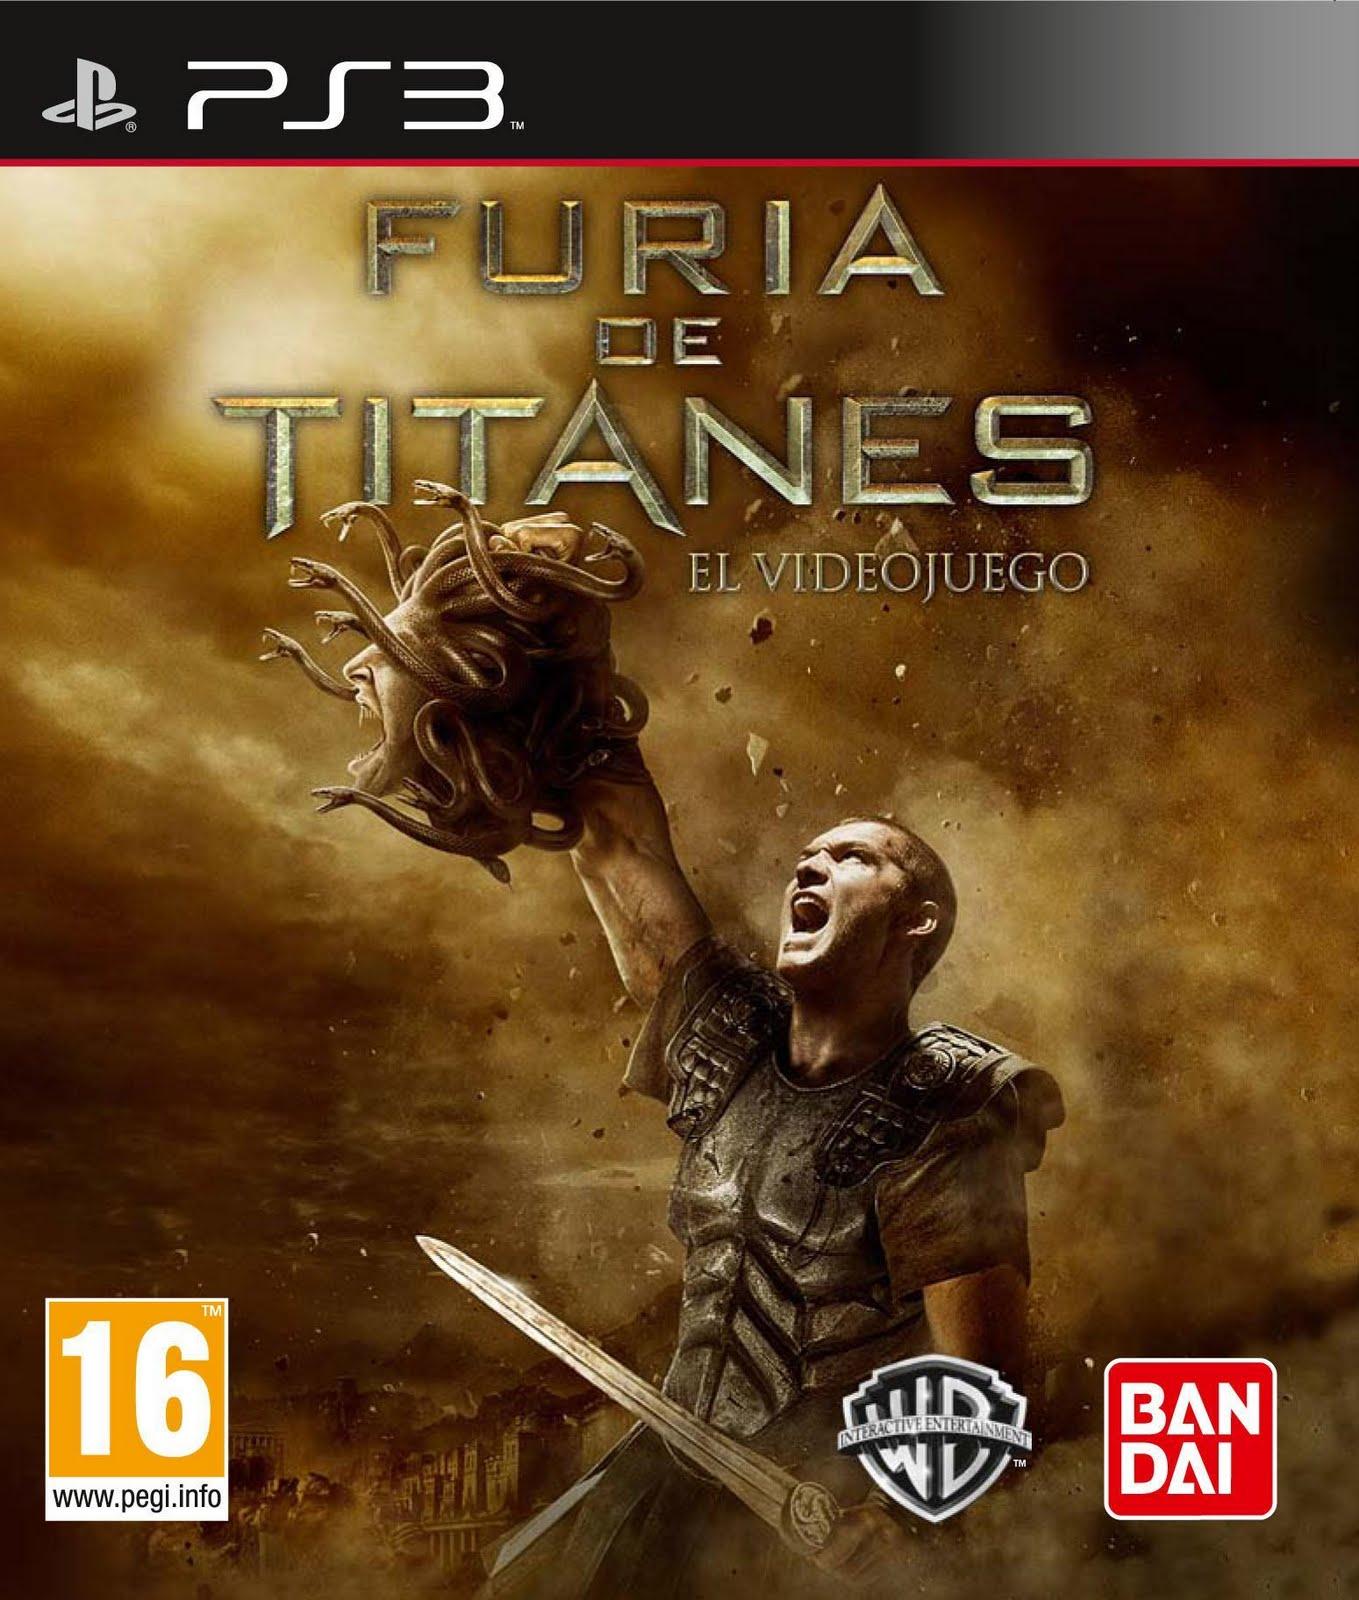 de Titanes [PS3] [Español] [3.55 Kmeaw]  Descargar Gratis Djuego.com